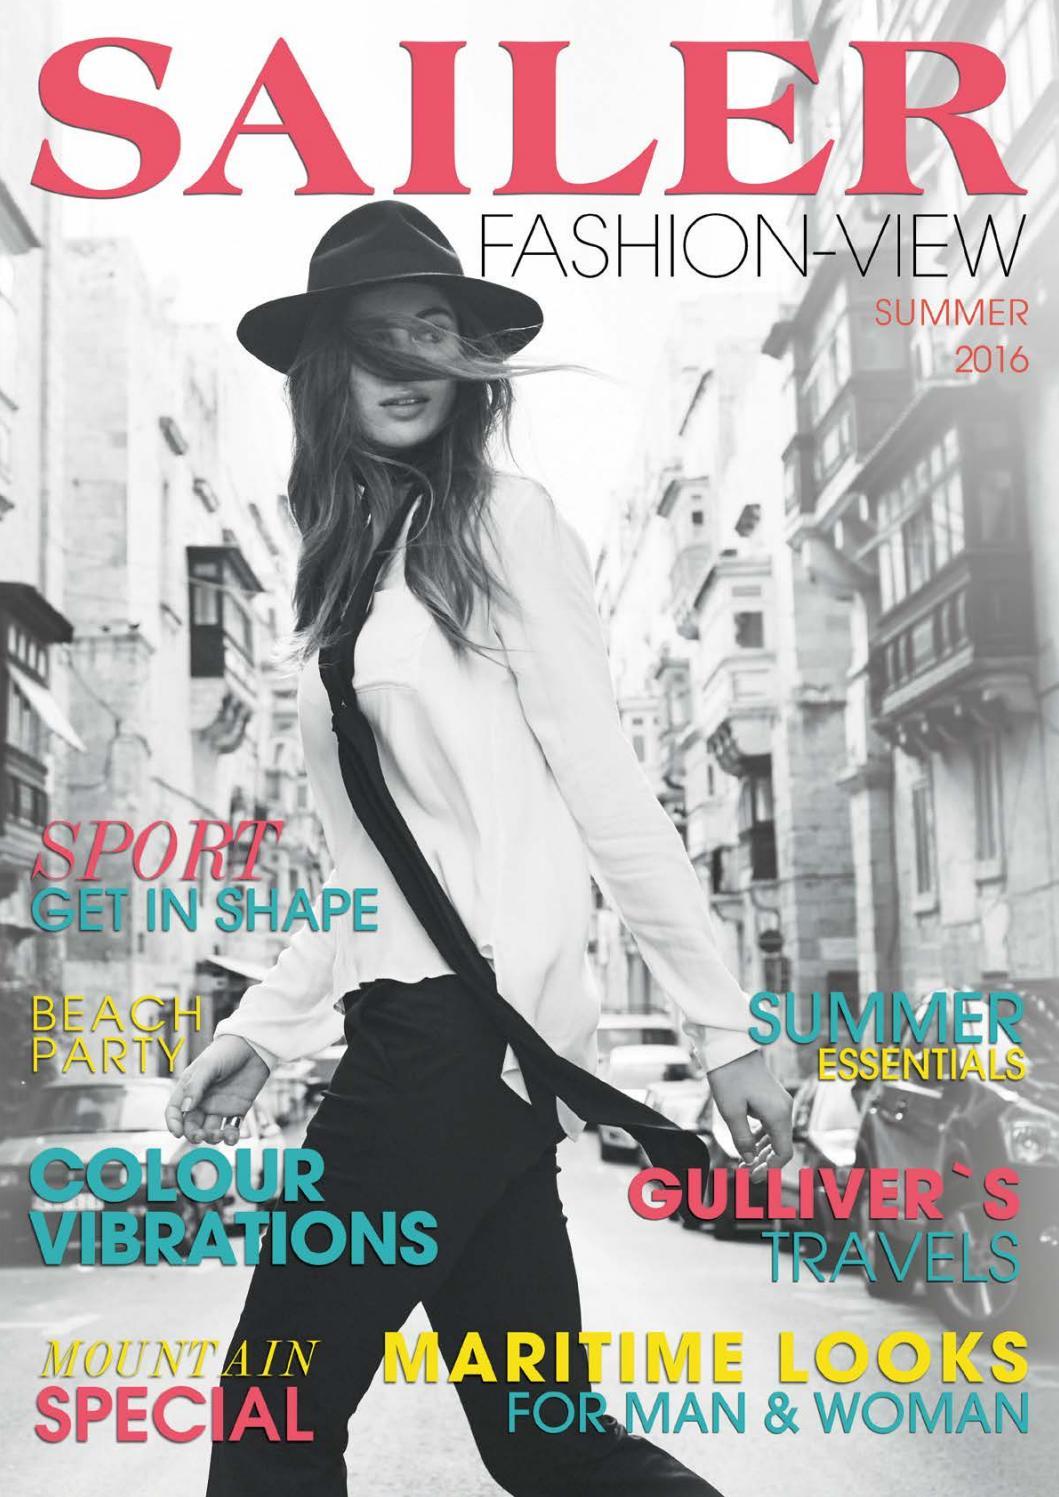 SAILER Fashion View Ausgabe IV Sommer 2016 by SAILERstyle